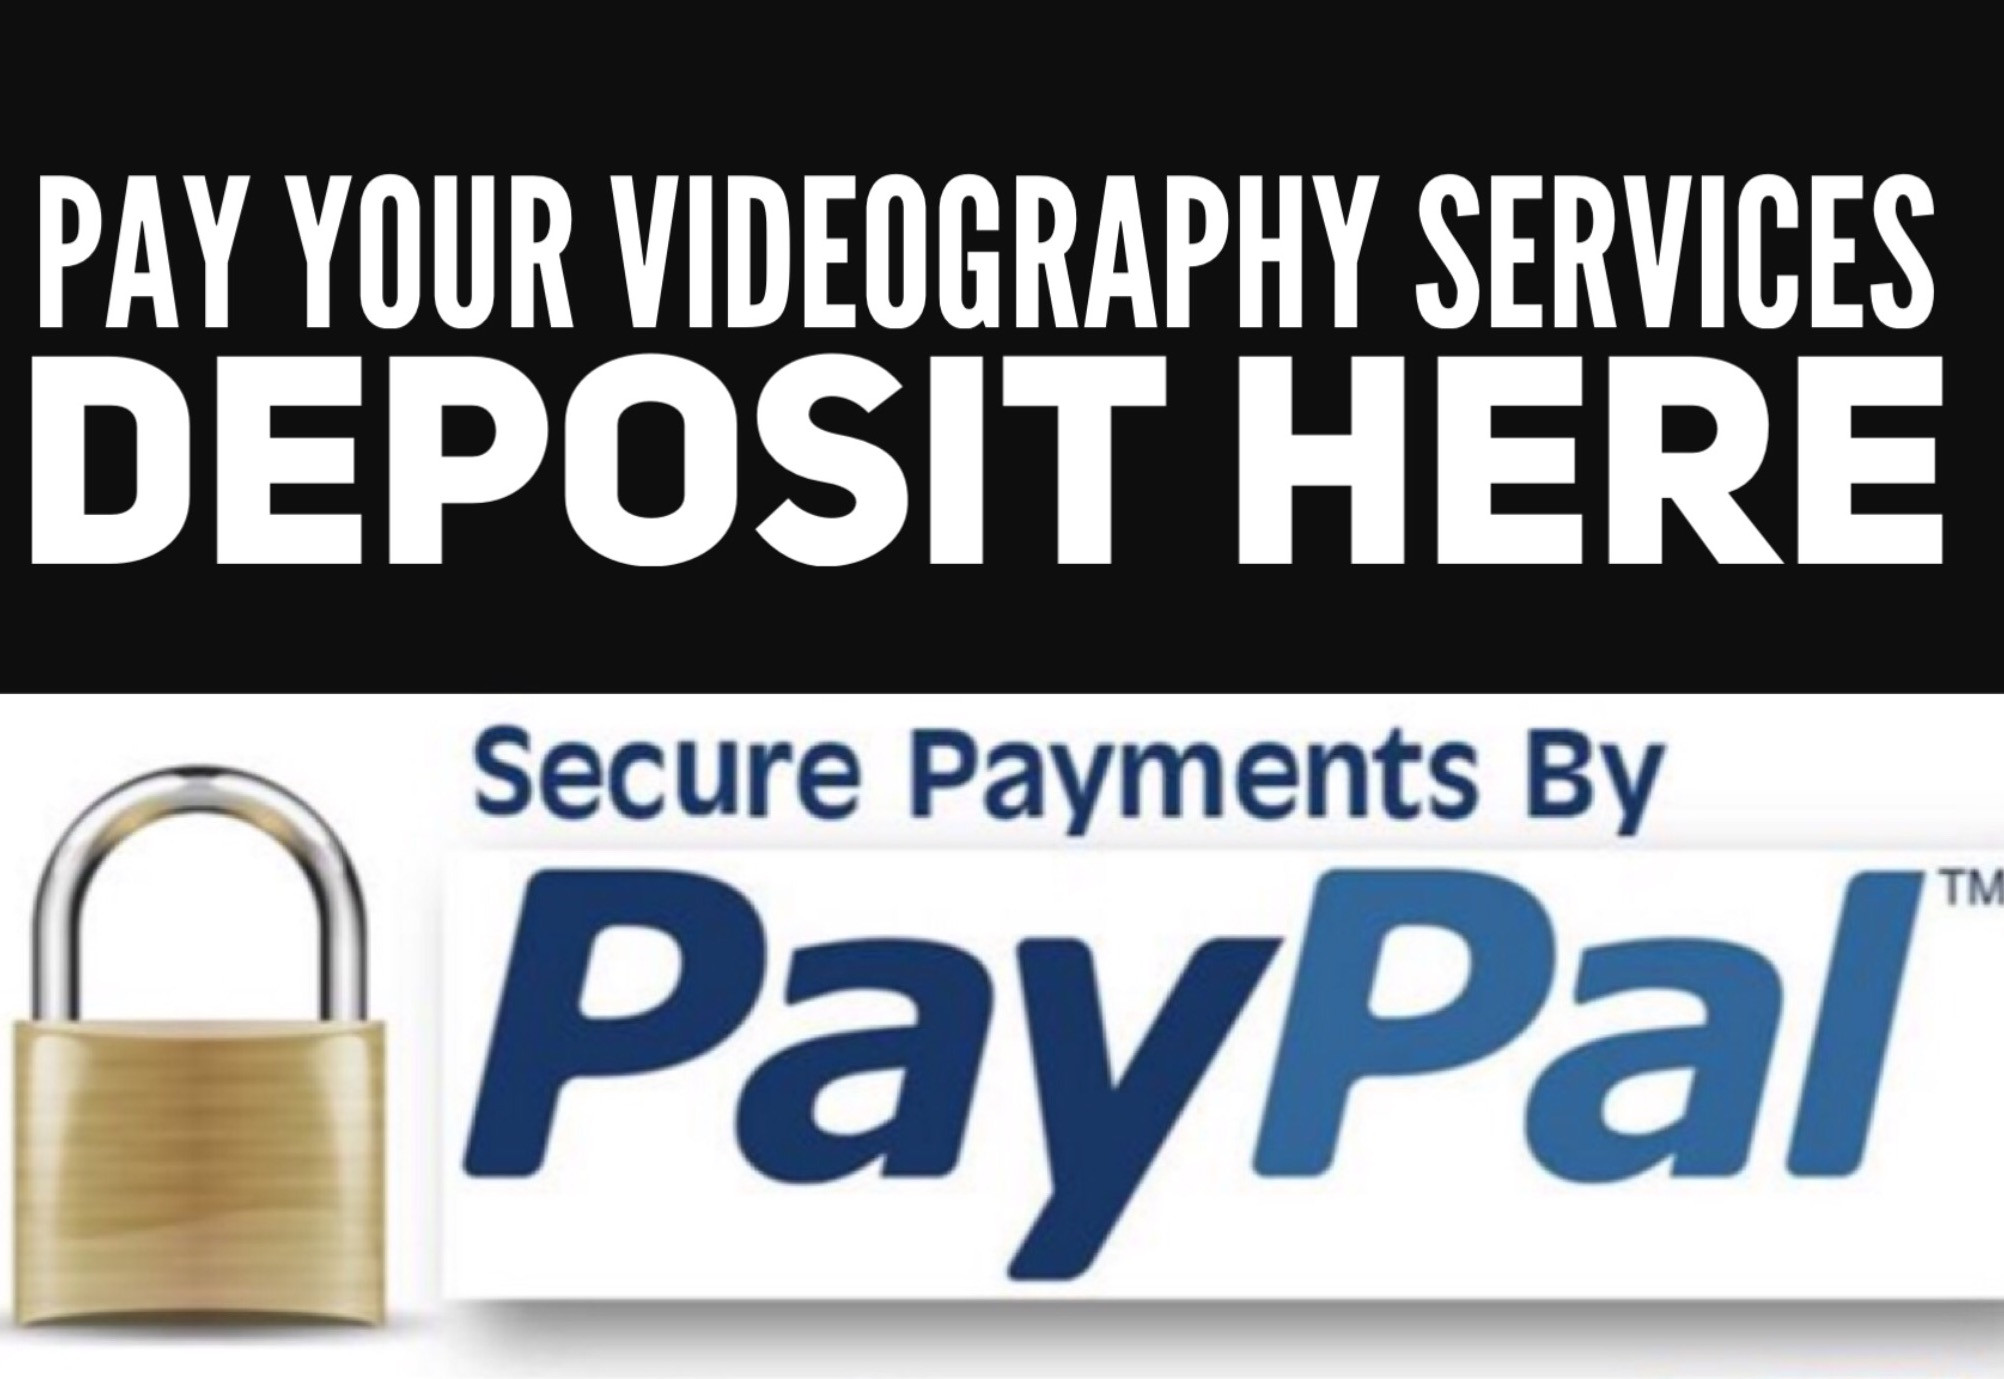 $100.00 Videography Deposit